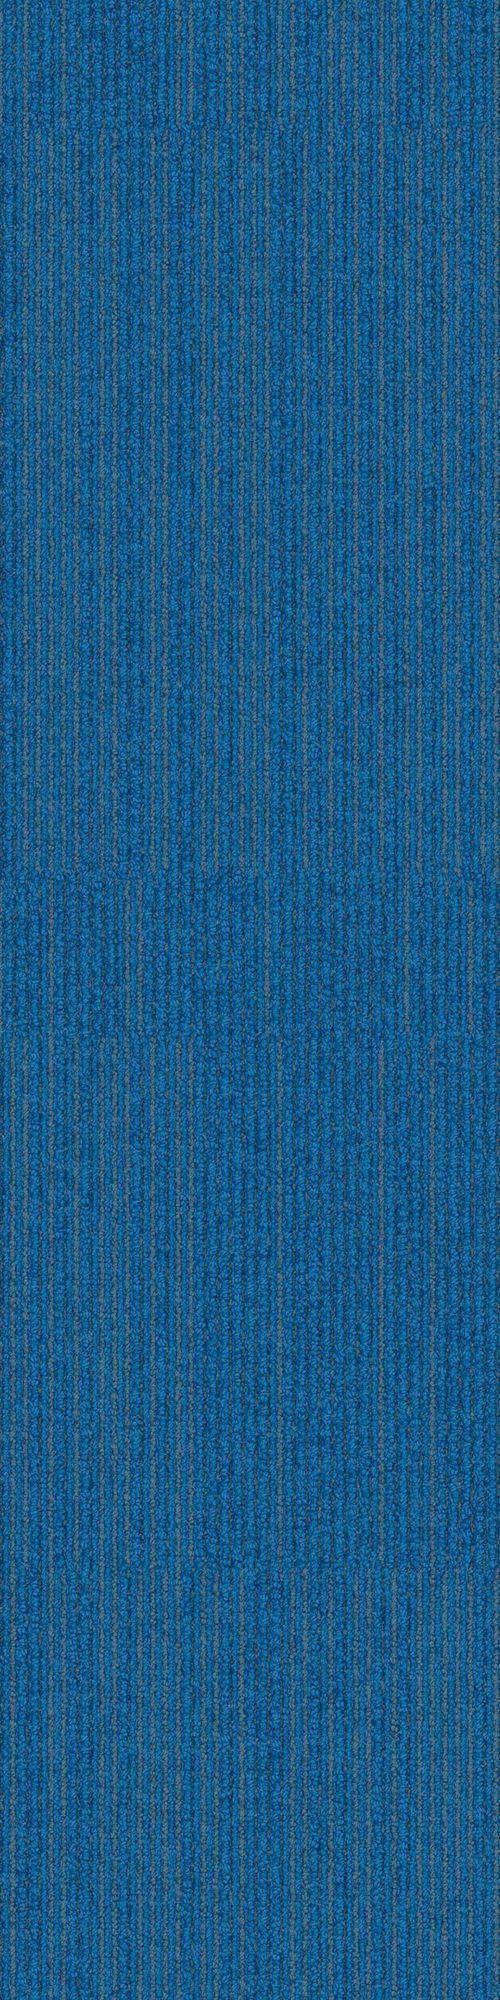 Interface carpet tile: On Line Color name: Lapis Variant 5